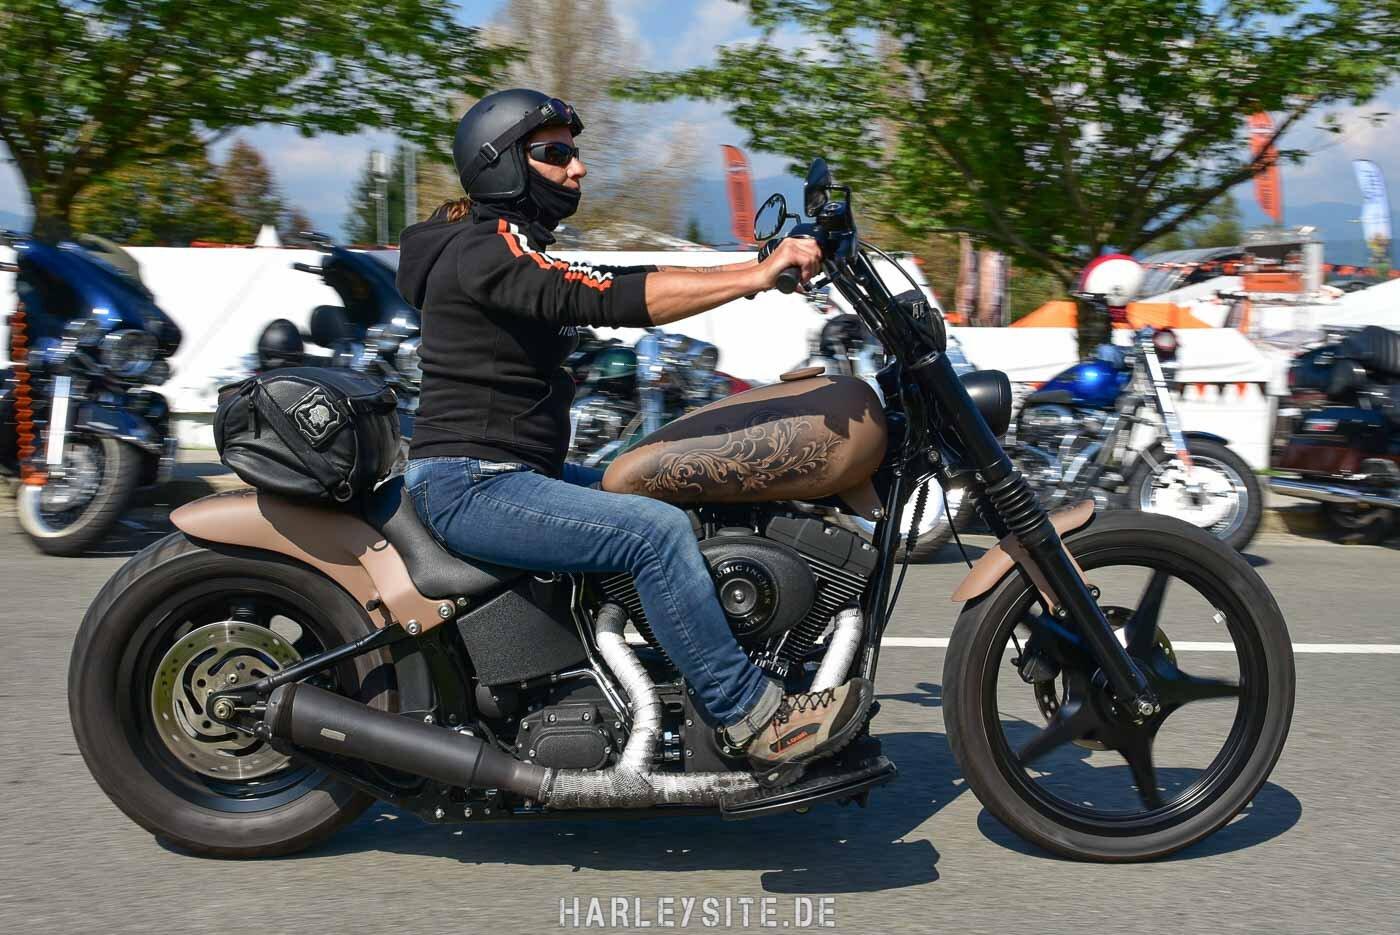 European-Bike-Week-9725